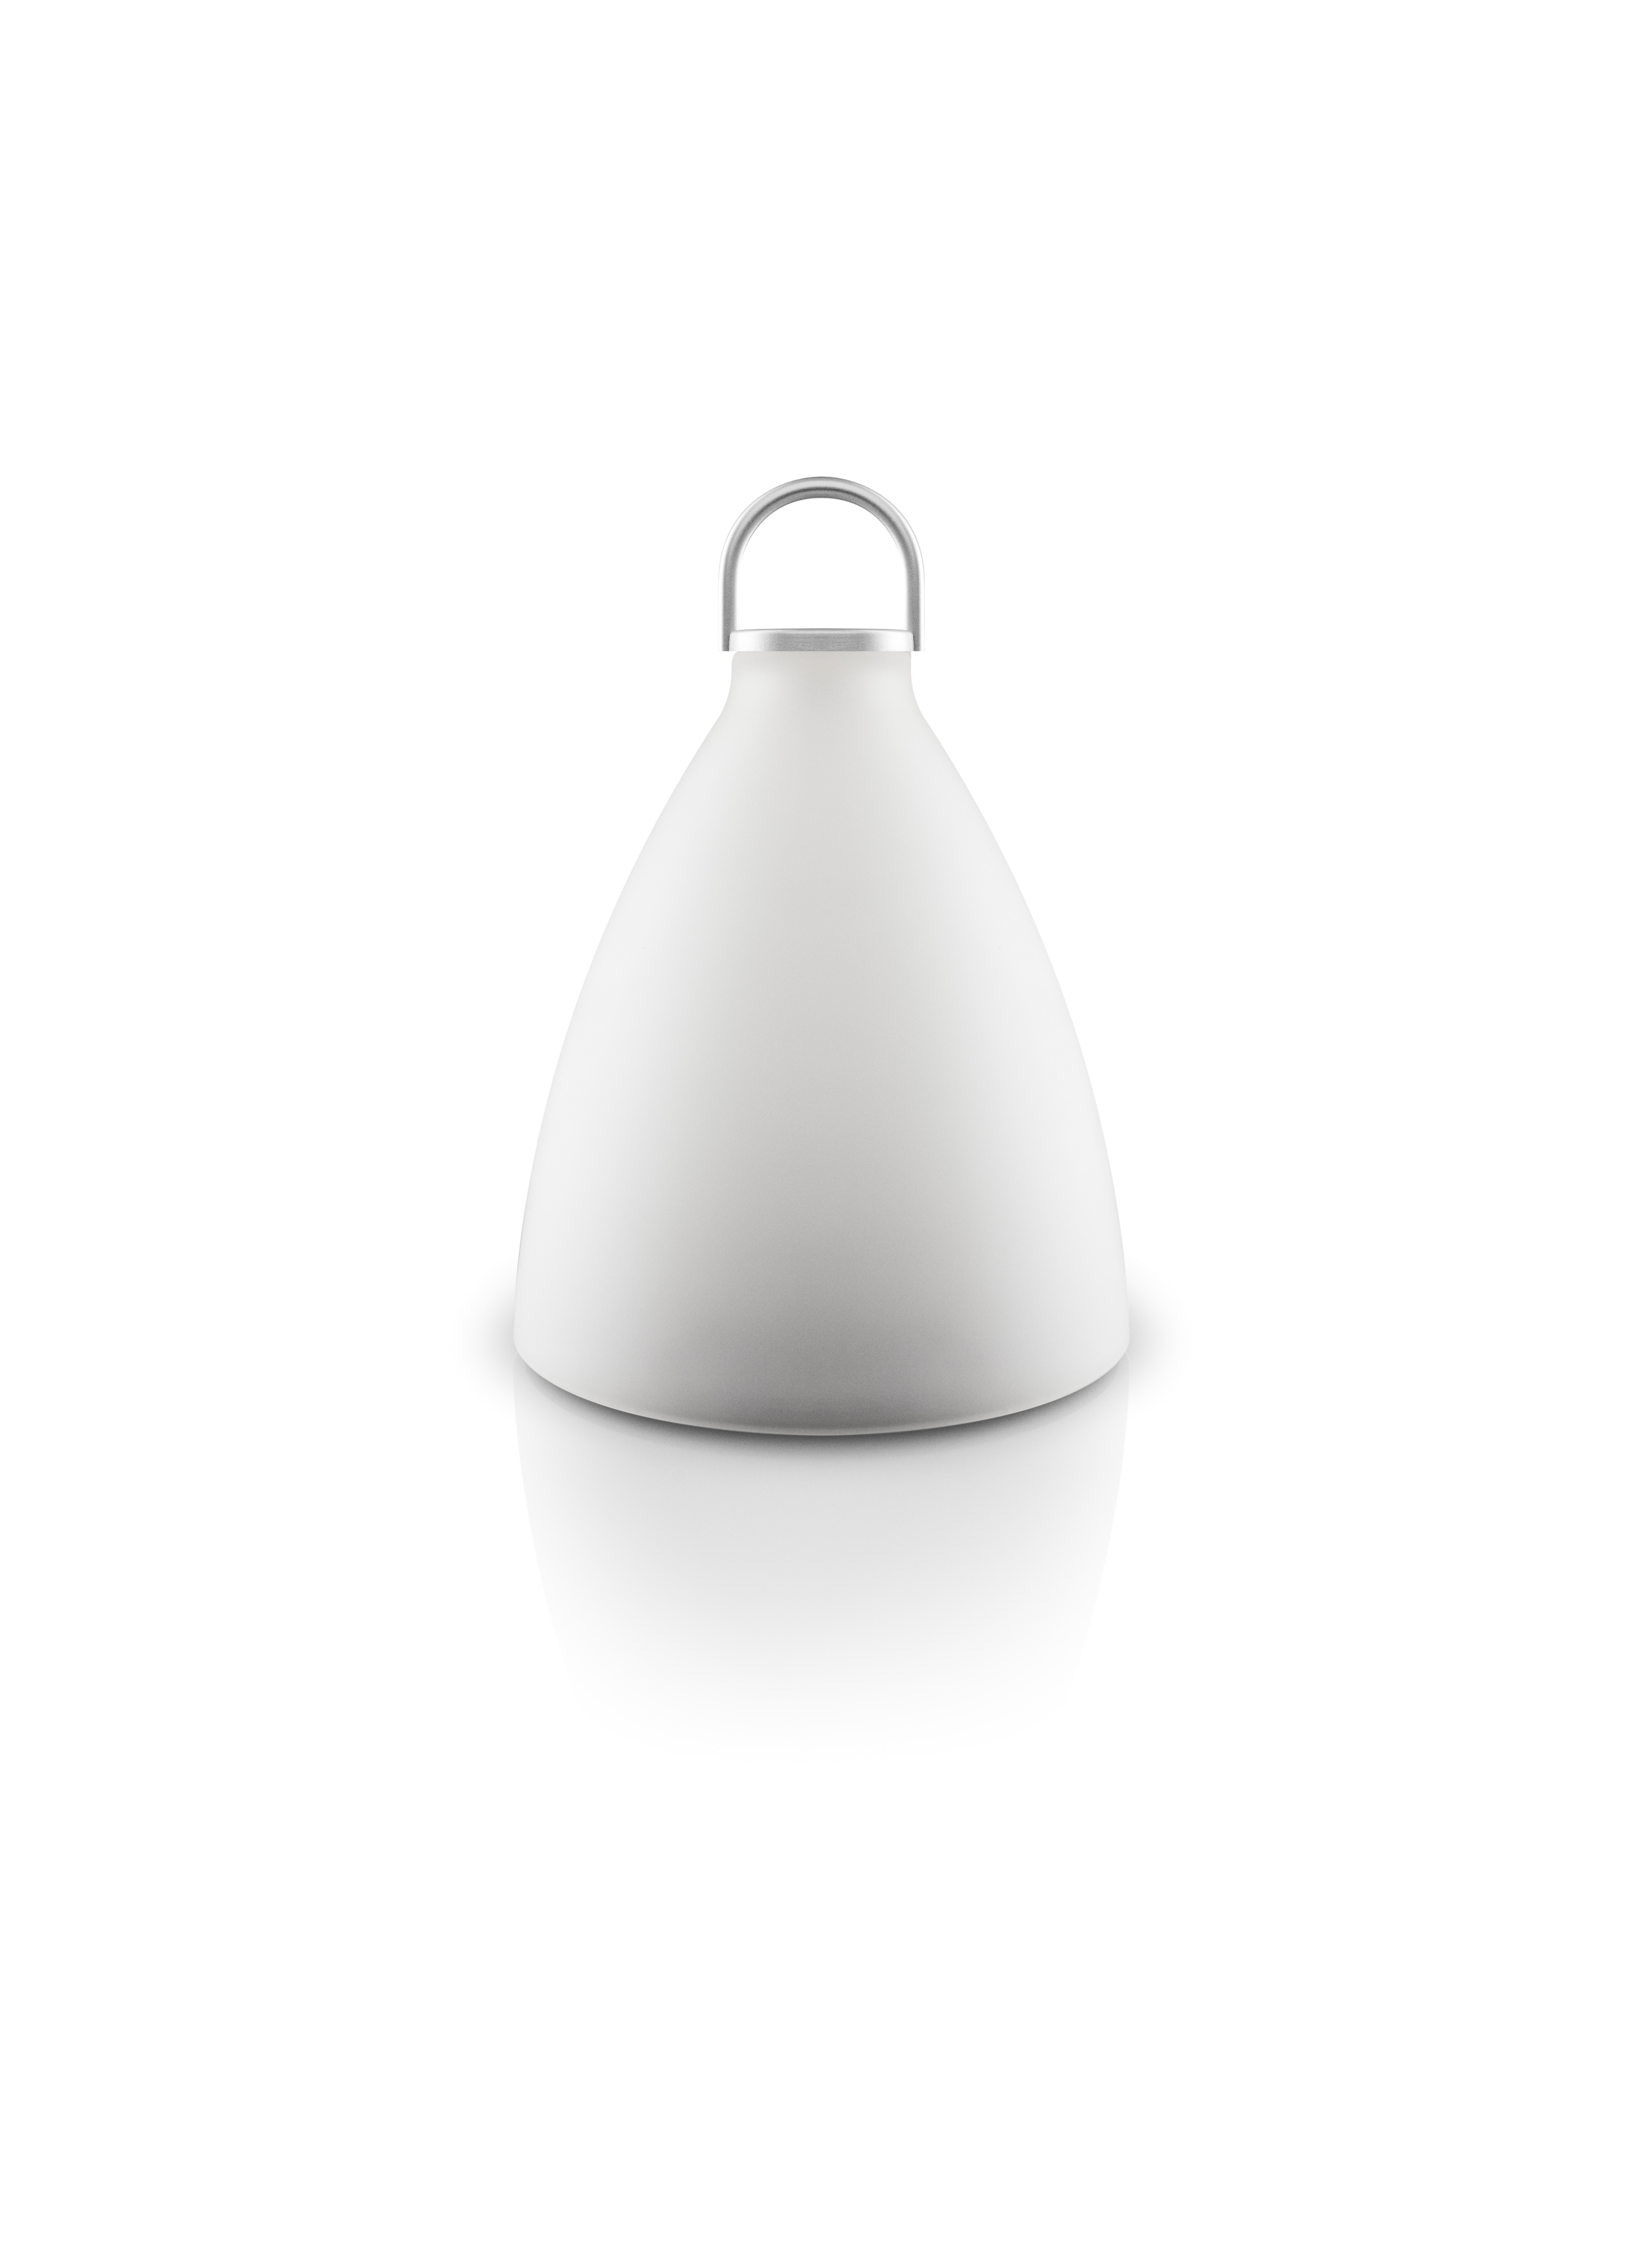 Eva Solo - SunLight Bell Lamp Small (571327)